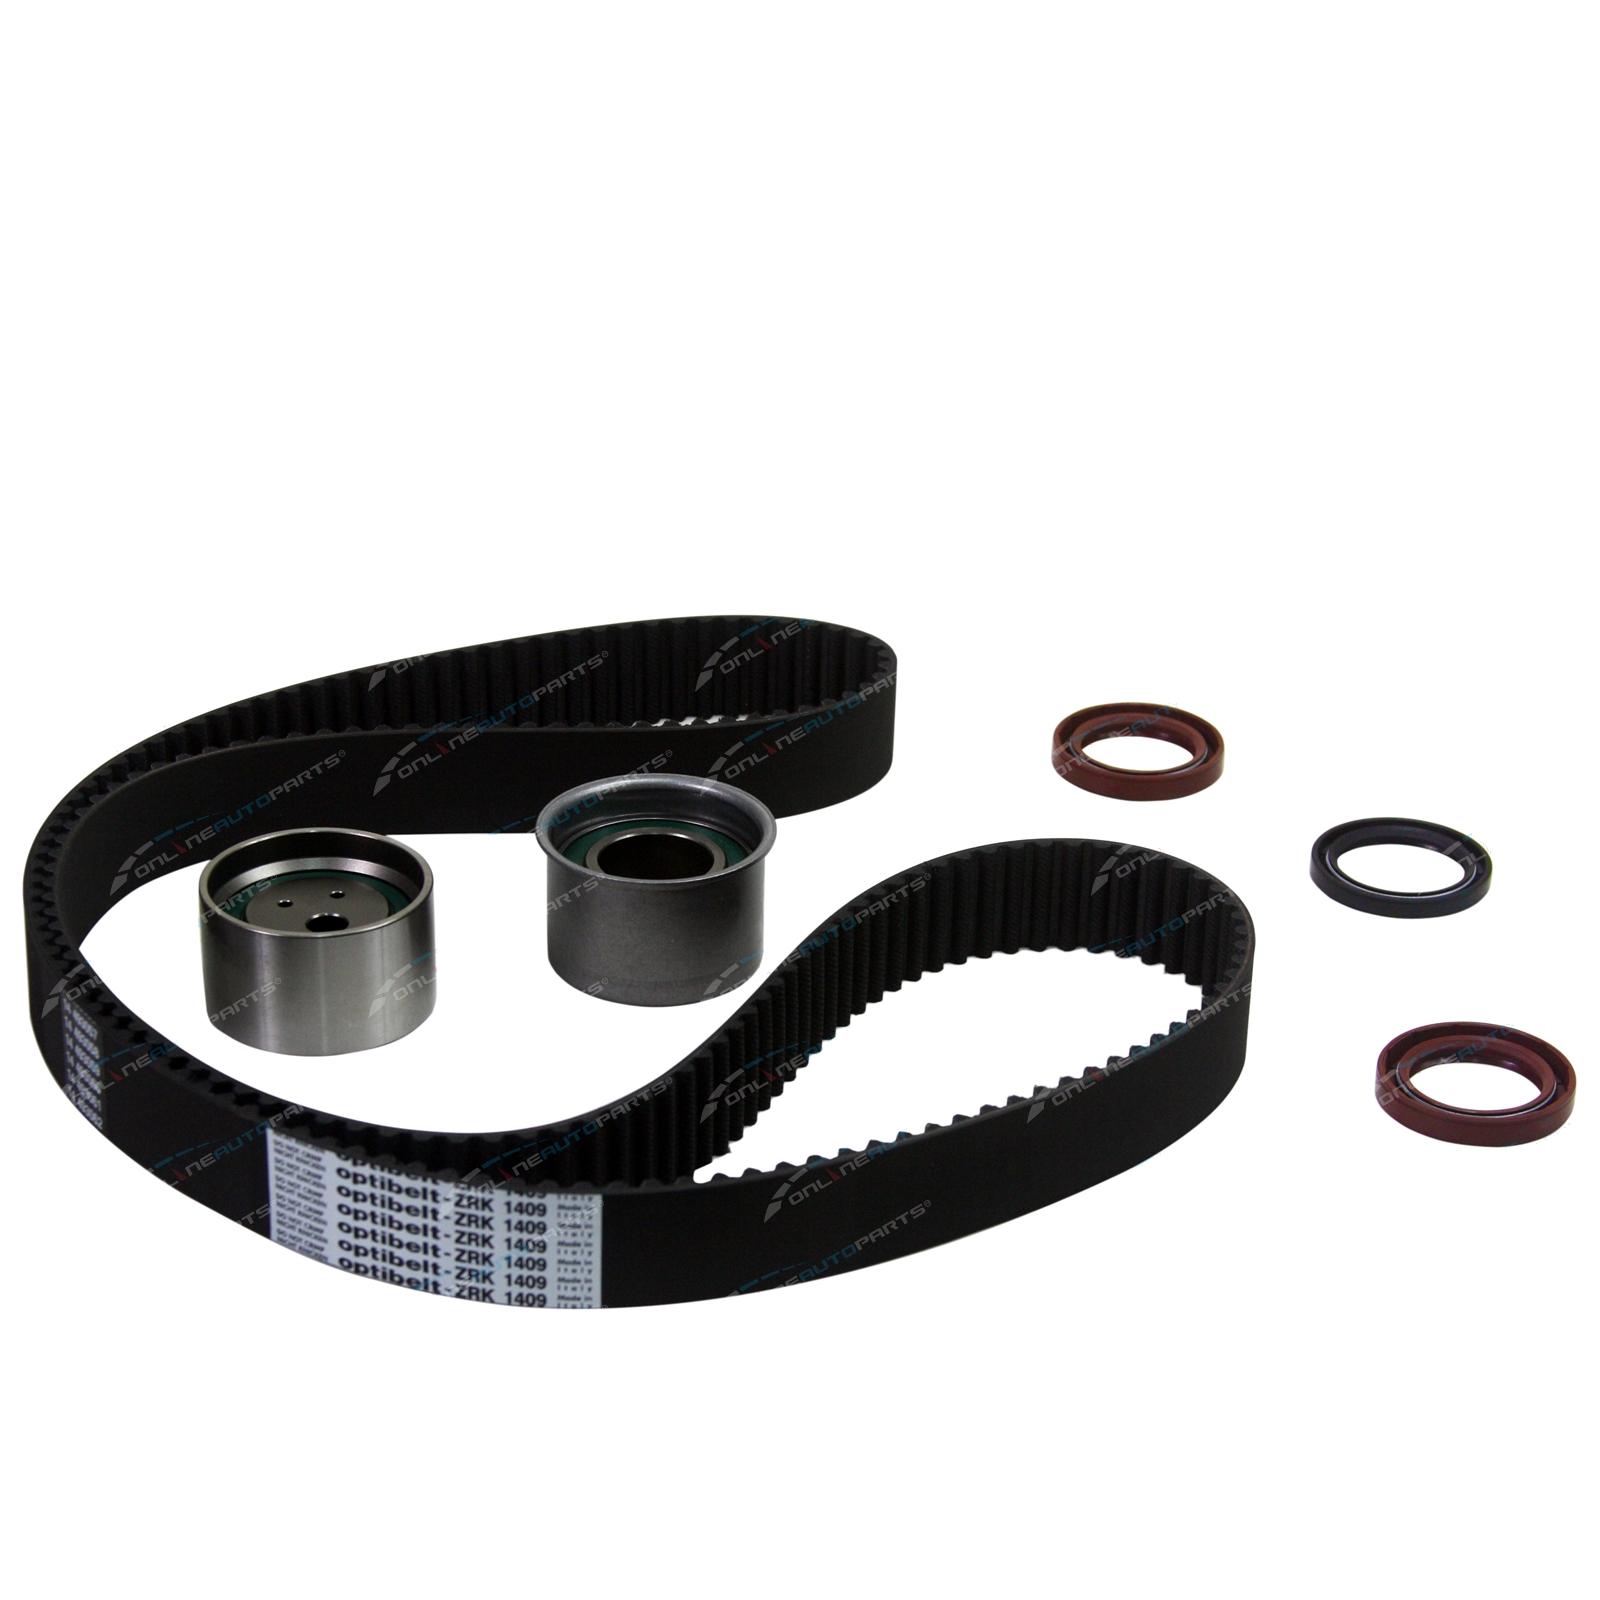 hight resolution of timing belt tensioner kit optibelt suits mitsubishi verada kj